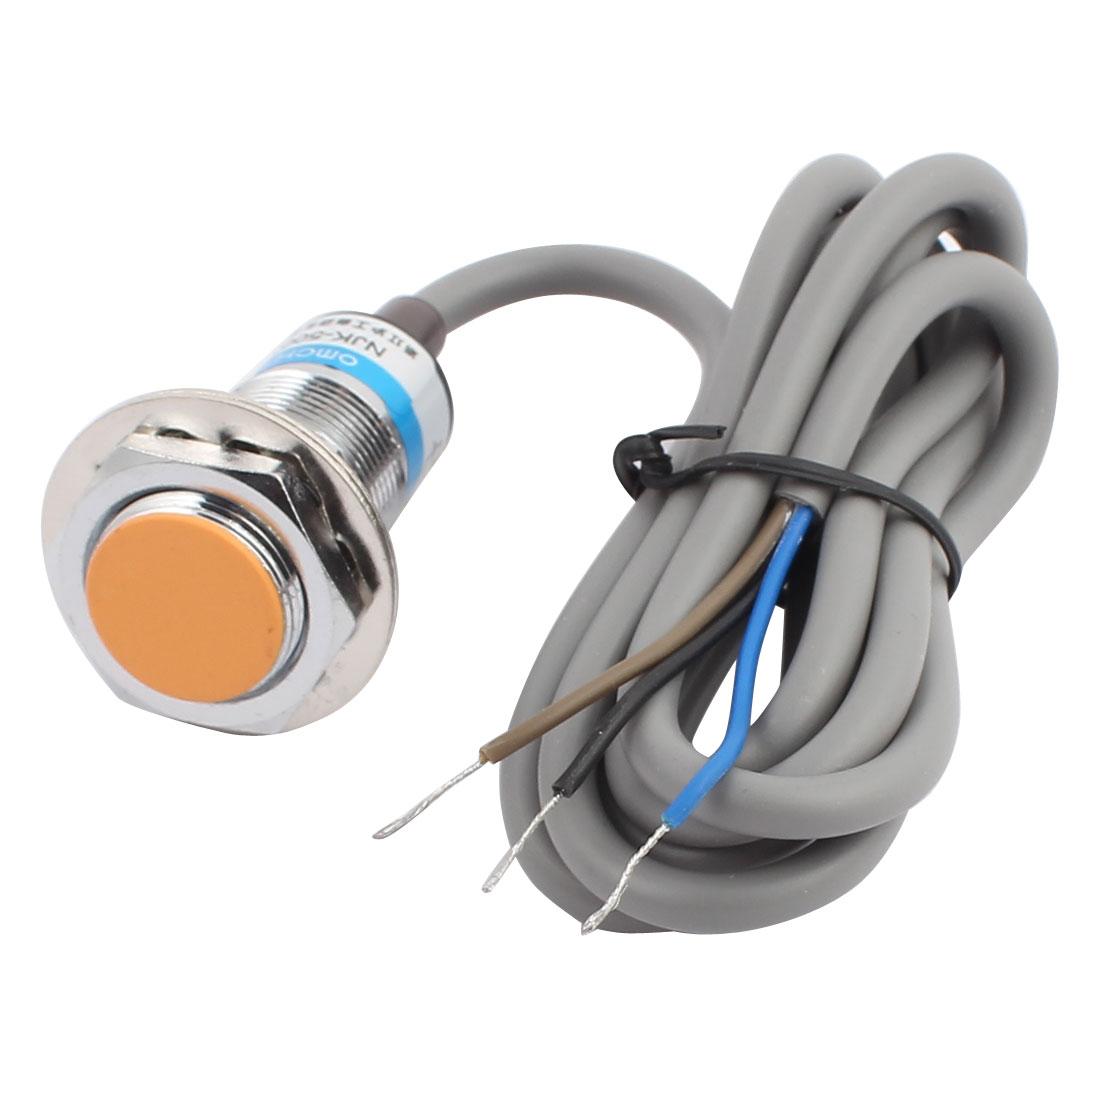 NJK-5003 DC 6-36V 300mA PNP NO 10mm Inductive Proximity Sensor Switch 3-wire